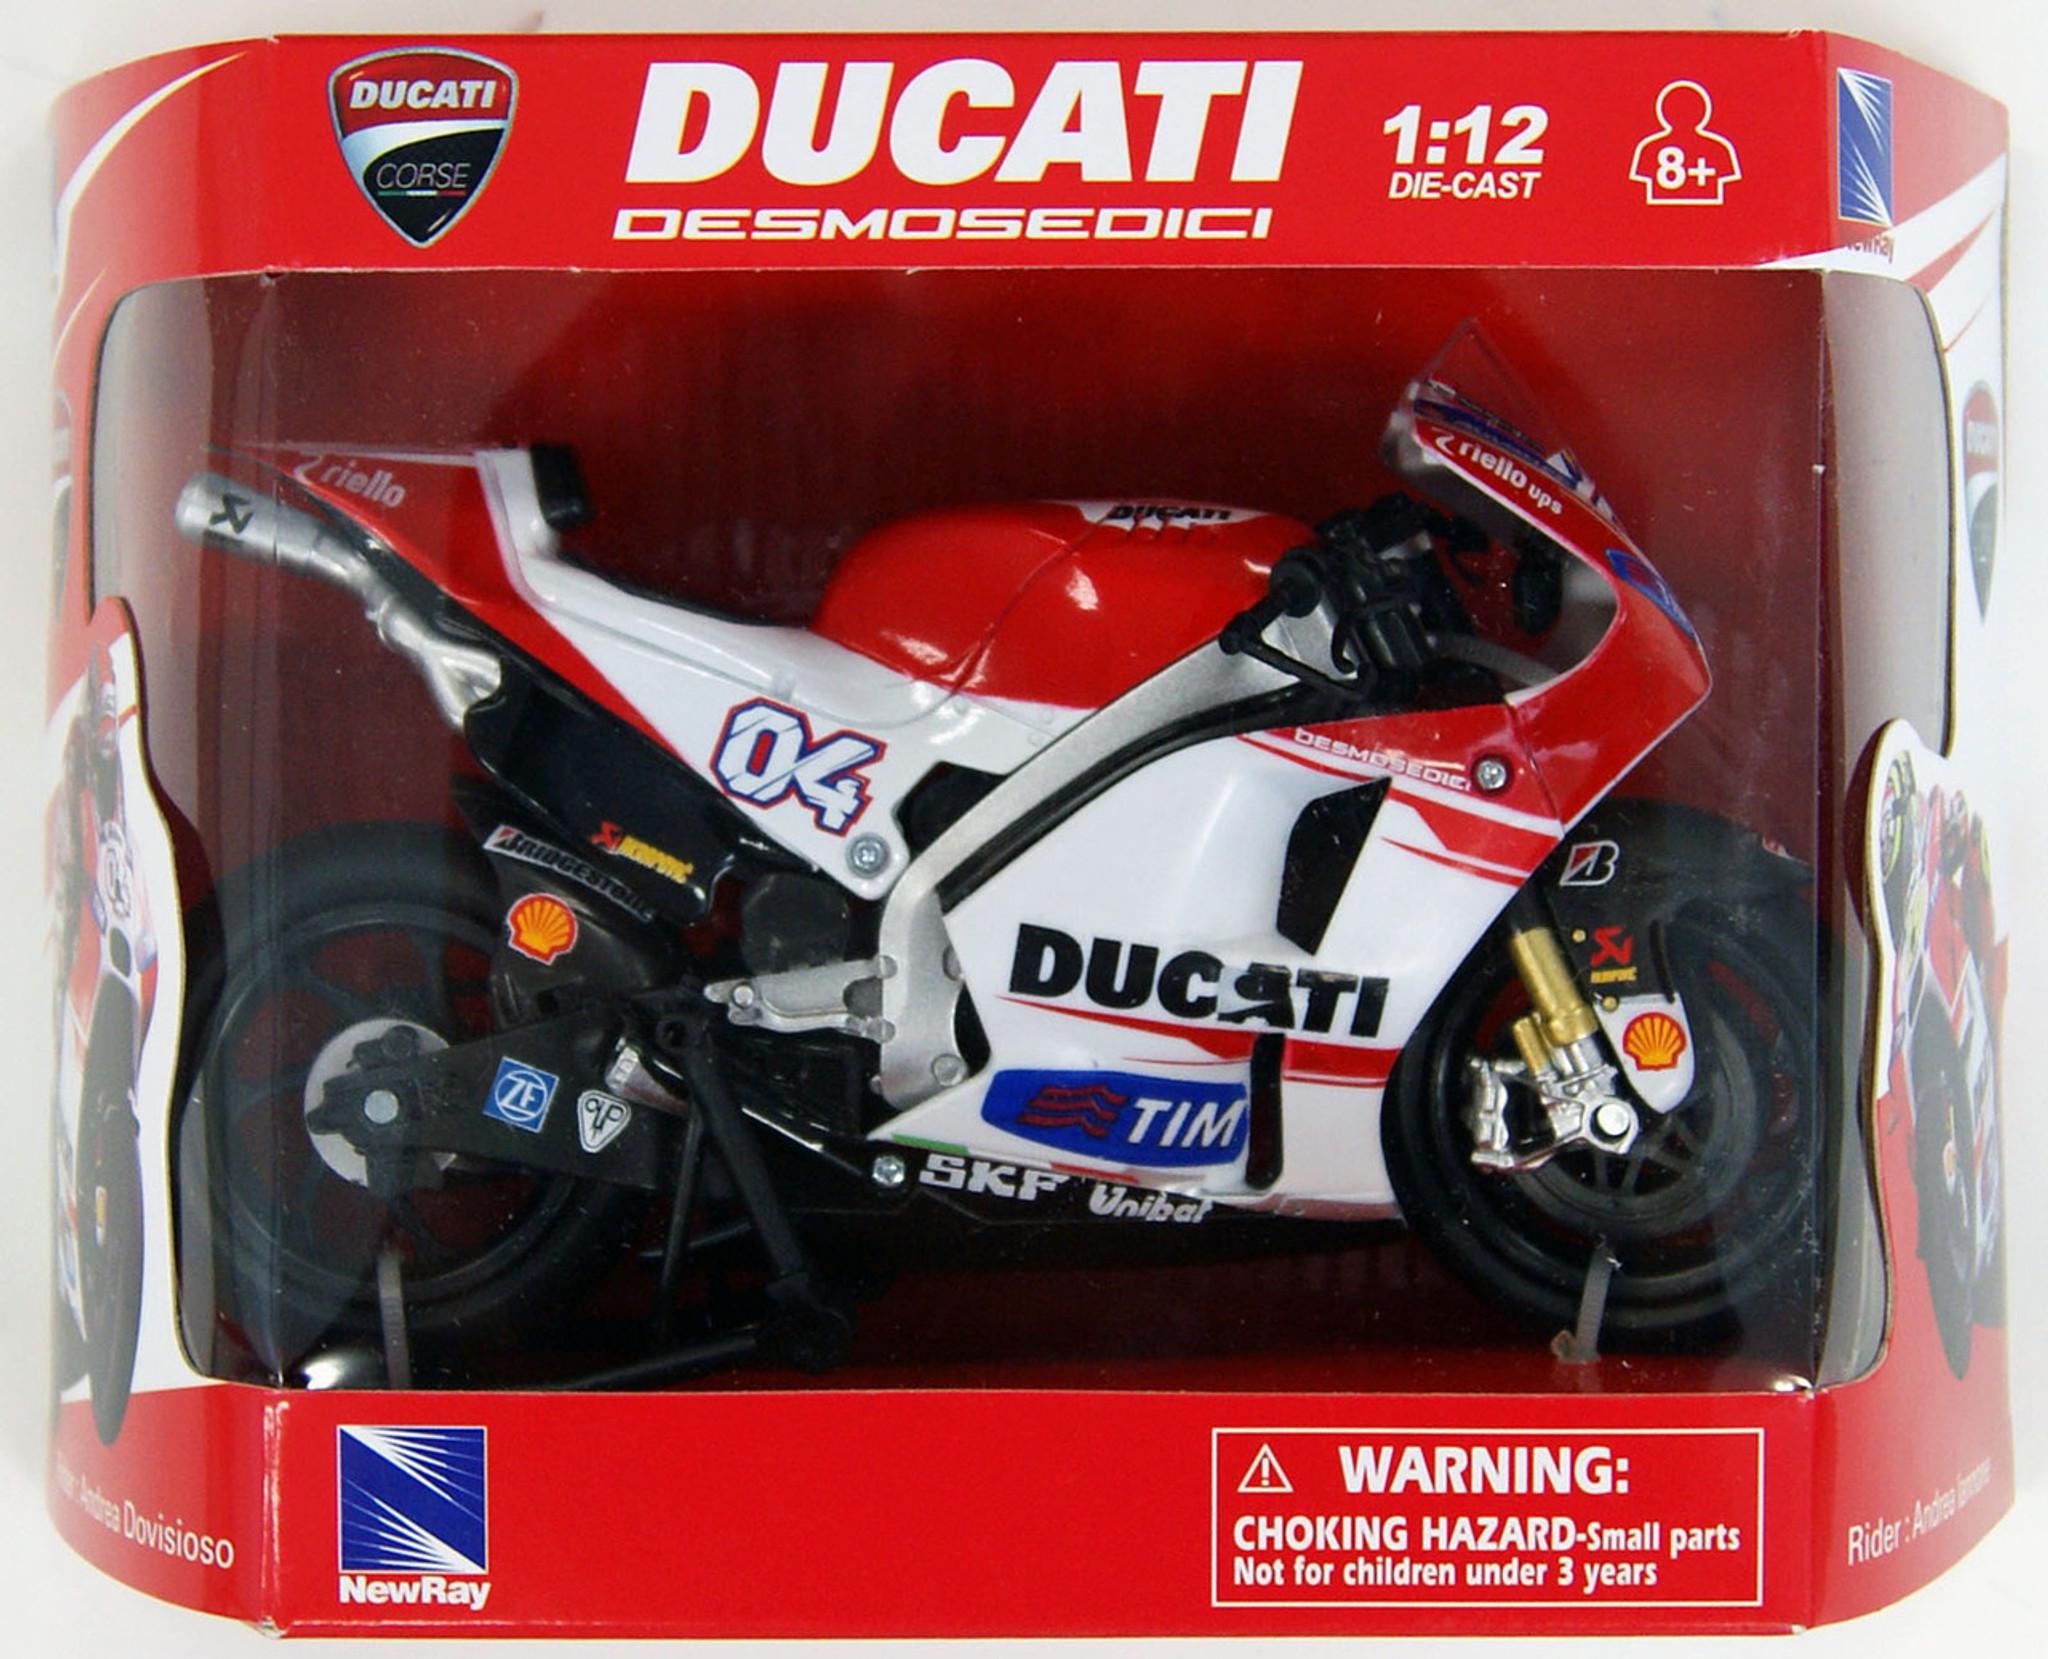 Aoshima Skynet 97229 2015 Ducati Desmosedici Gp15 Andrea Dovizioso Tamiya Scale Kits No4 1